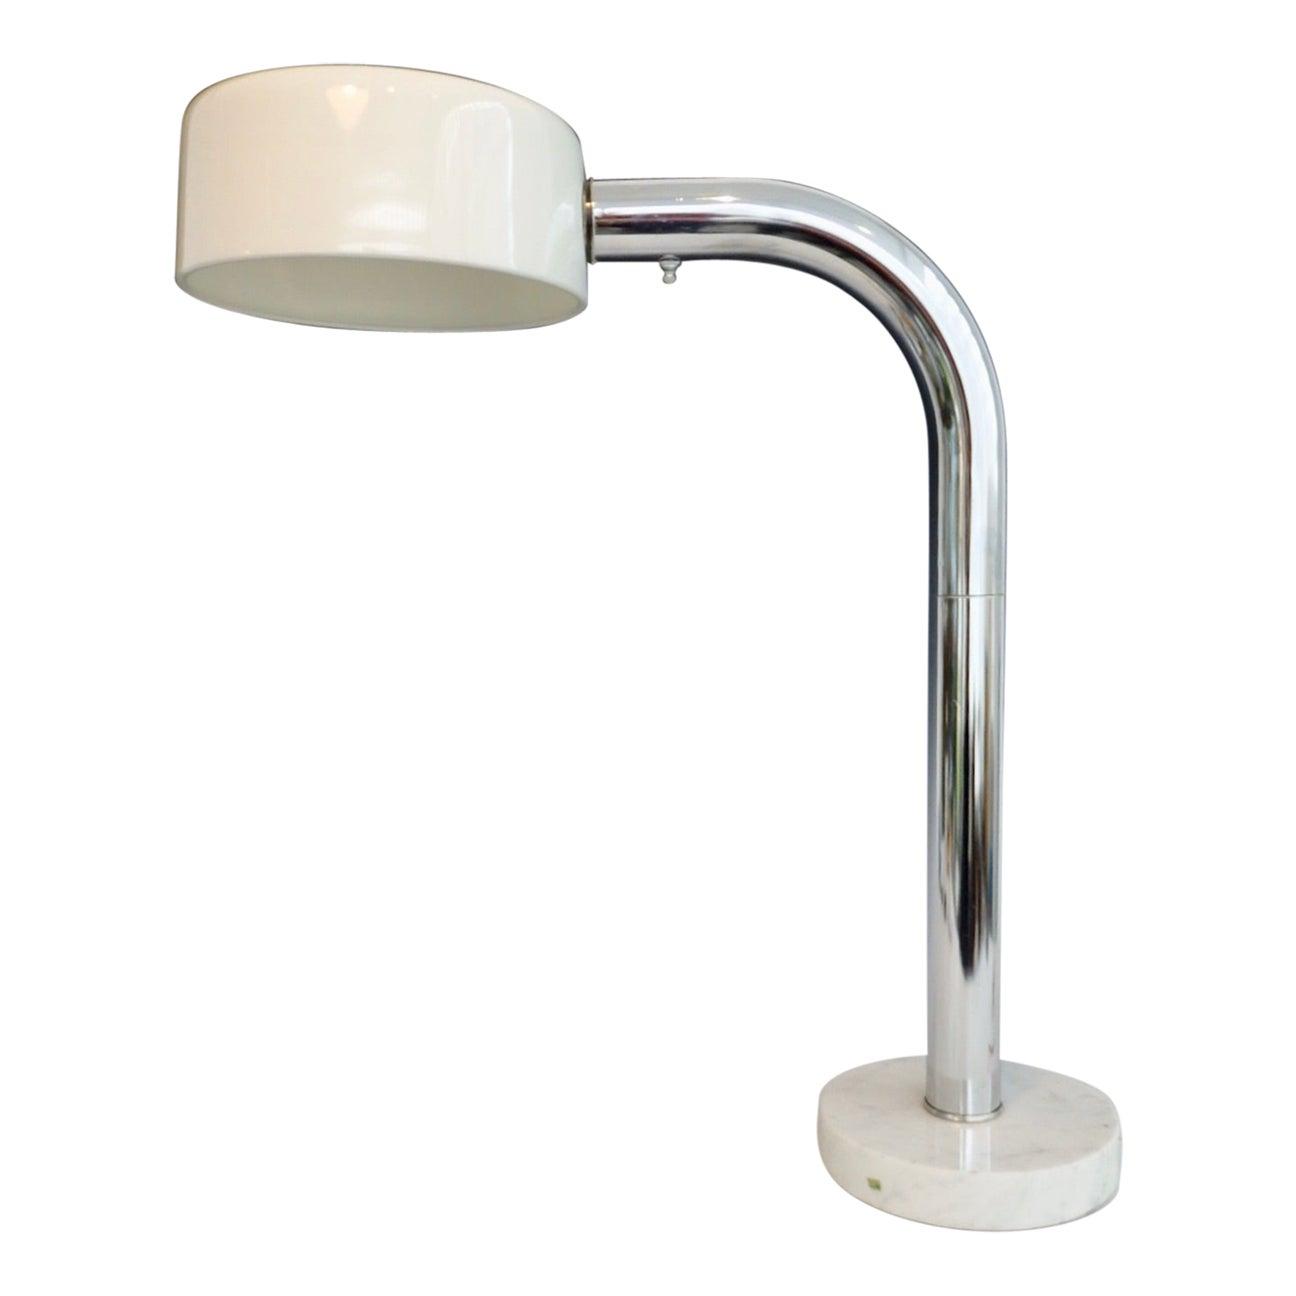 Chrome Gooseneck Desk Lamp on Italian Marble Base with Adjustable Deflector